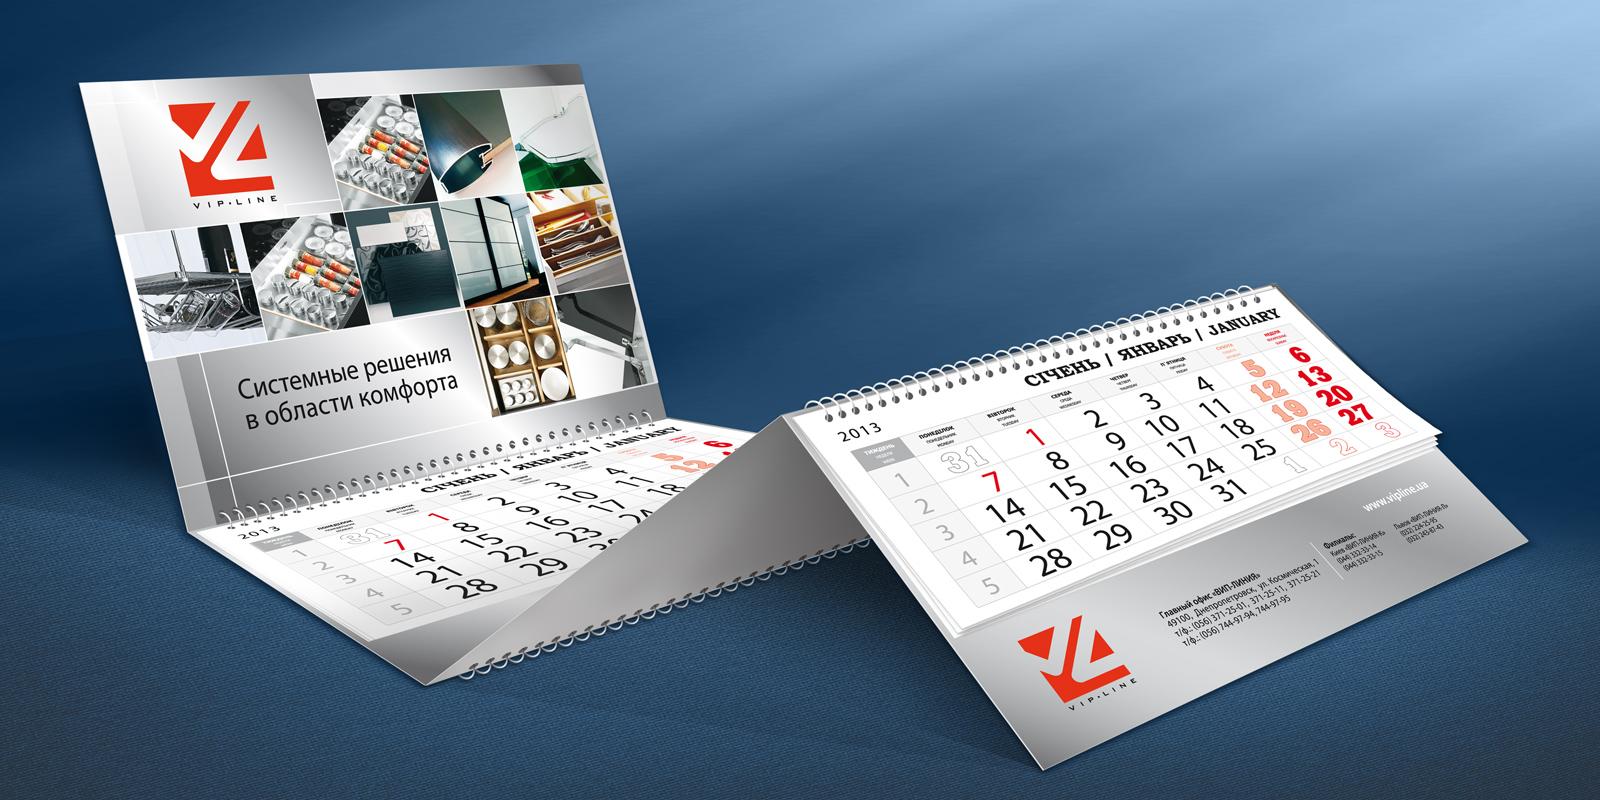 Компания «Вип Линия»;;;;;;Разработка корпоративного календаря  для компании VIP-LINE;;;;;;<span>Клиент:</span> Компания «Вип Линия»;;;;;;;;;;;;Разработка корпоративного календаря  для компании VIP-LINE;;;;;;5